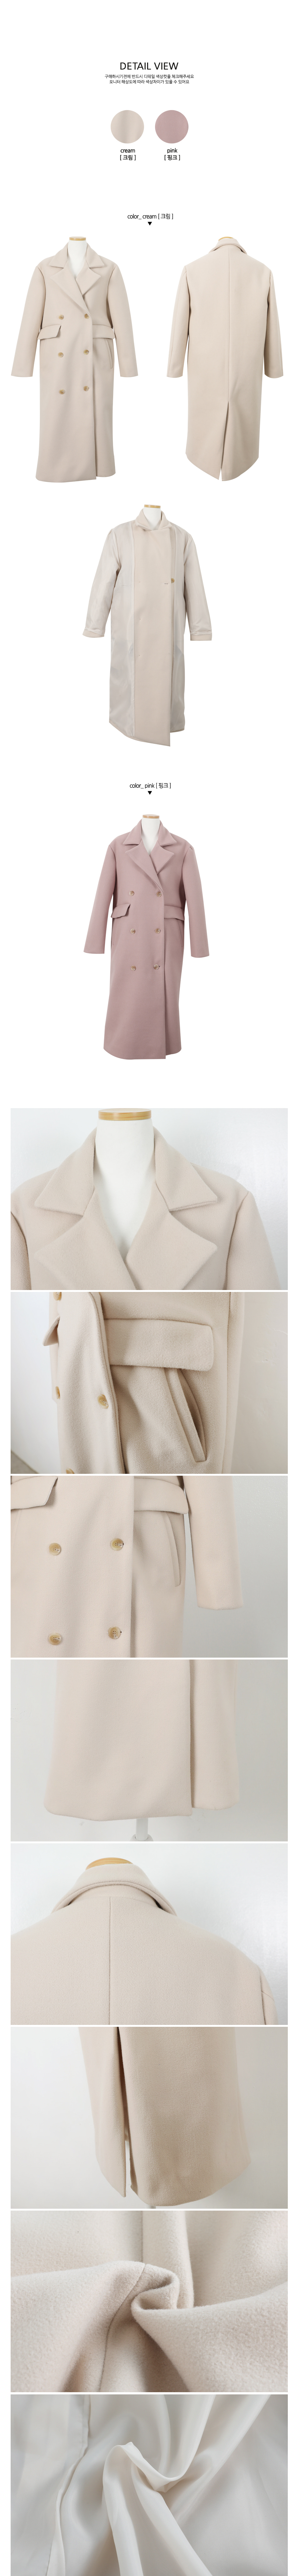 Prim Label Long Coat